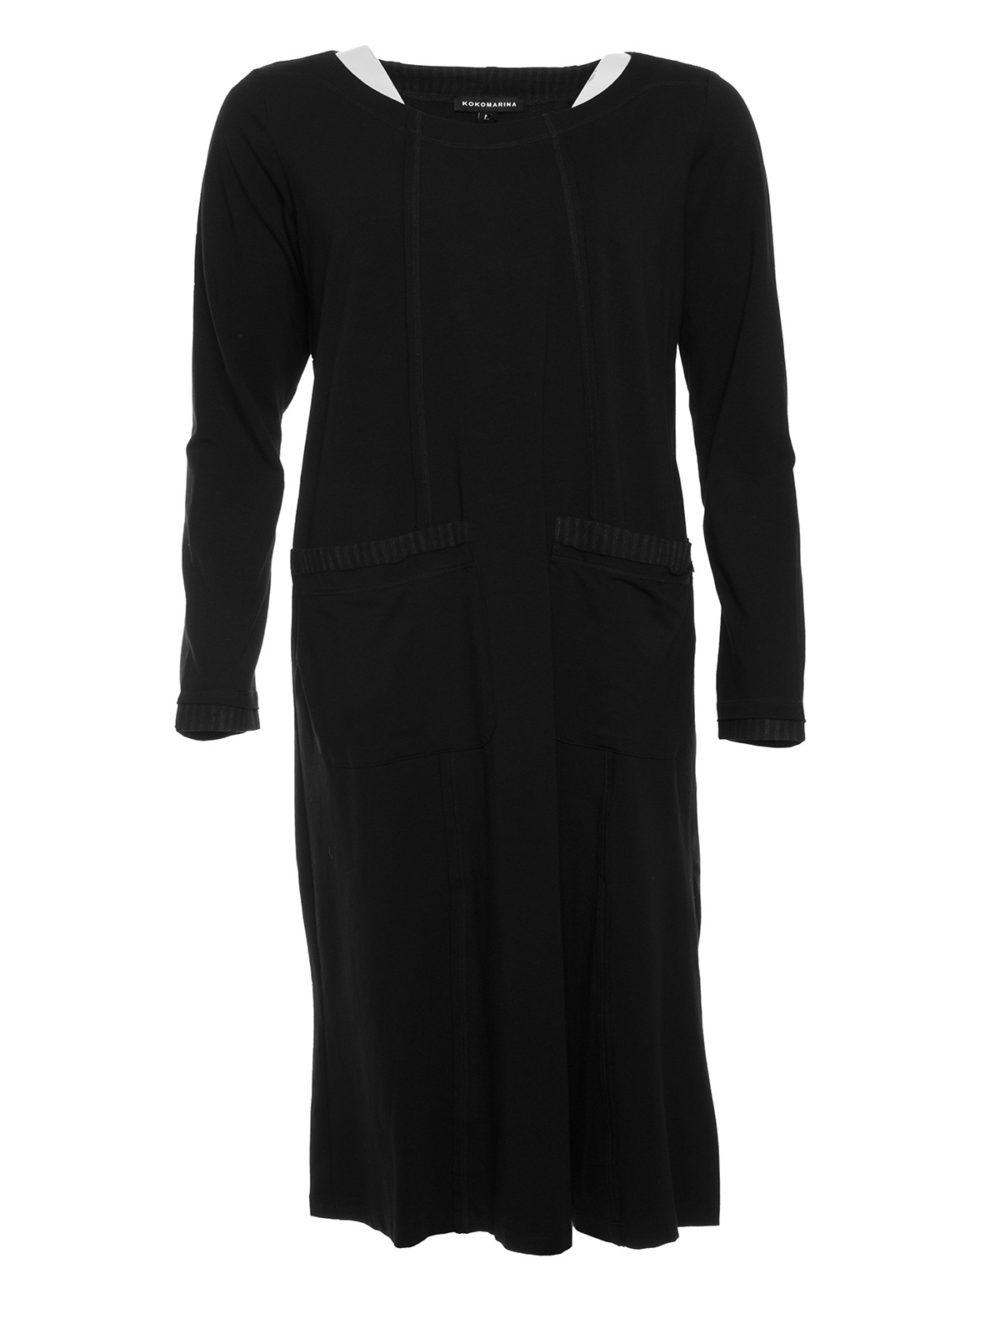 Tori Dress Kokomarina Katie Kerr Women's Clothing